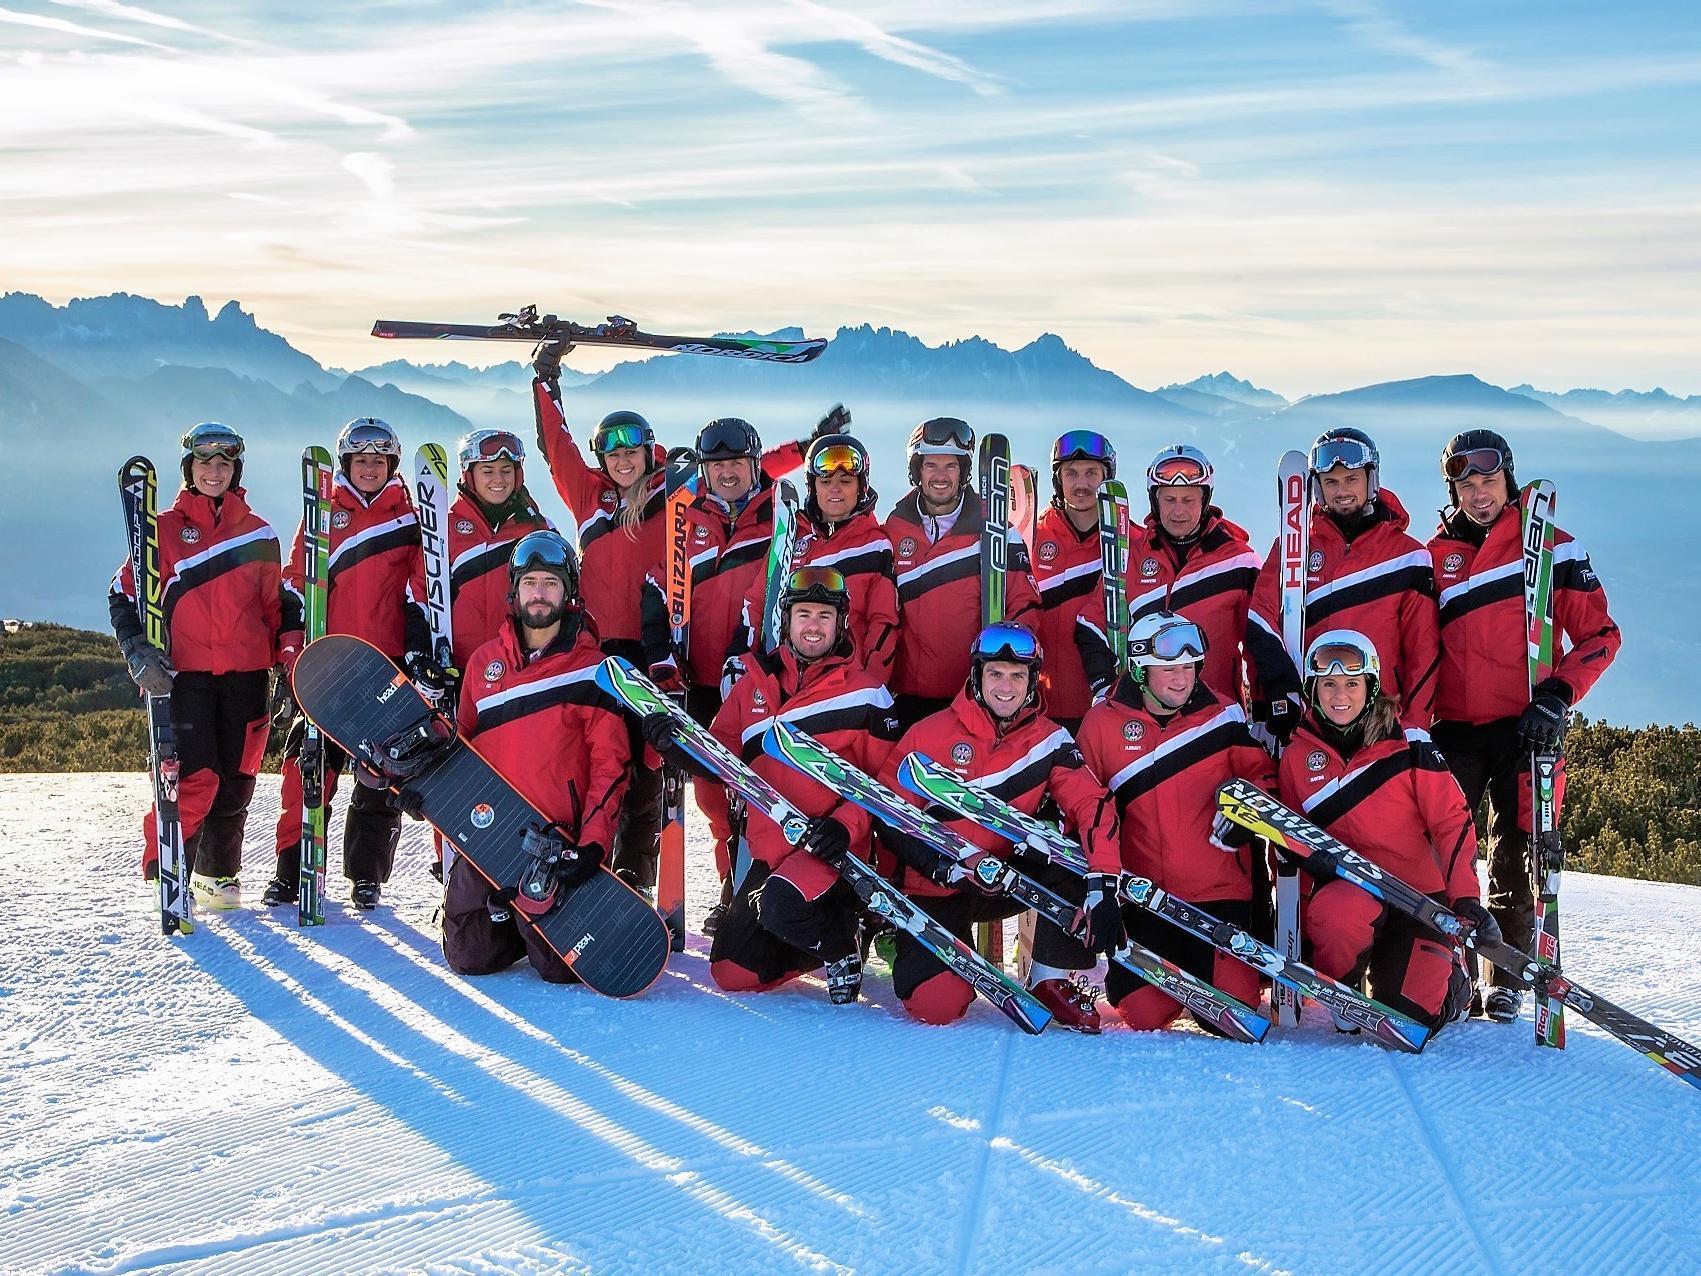 Skischule Rittnerhorn